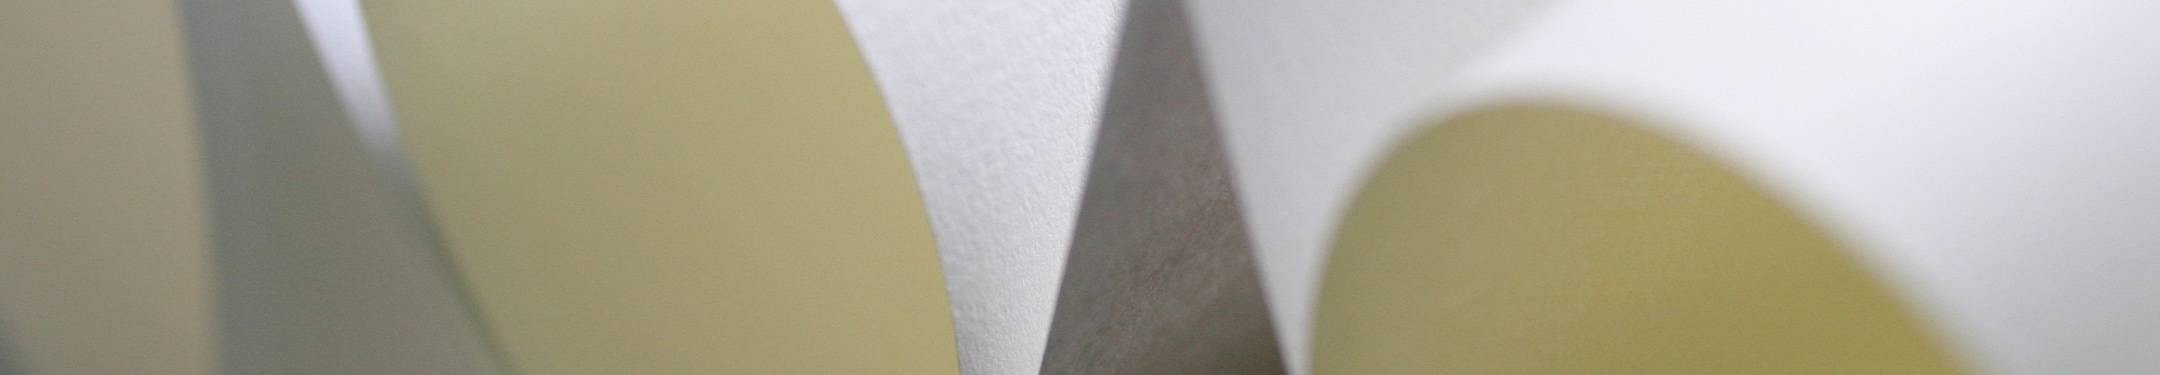 Neutech Cotton